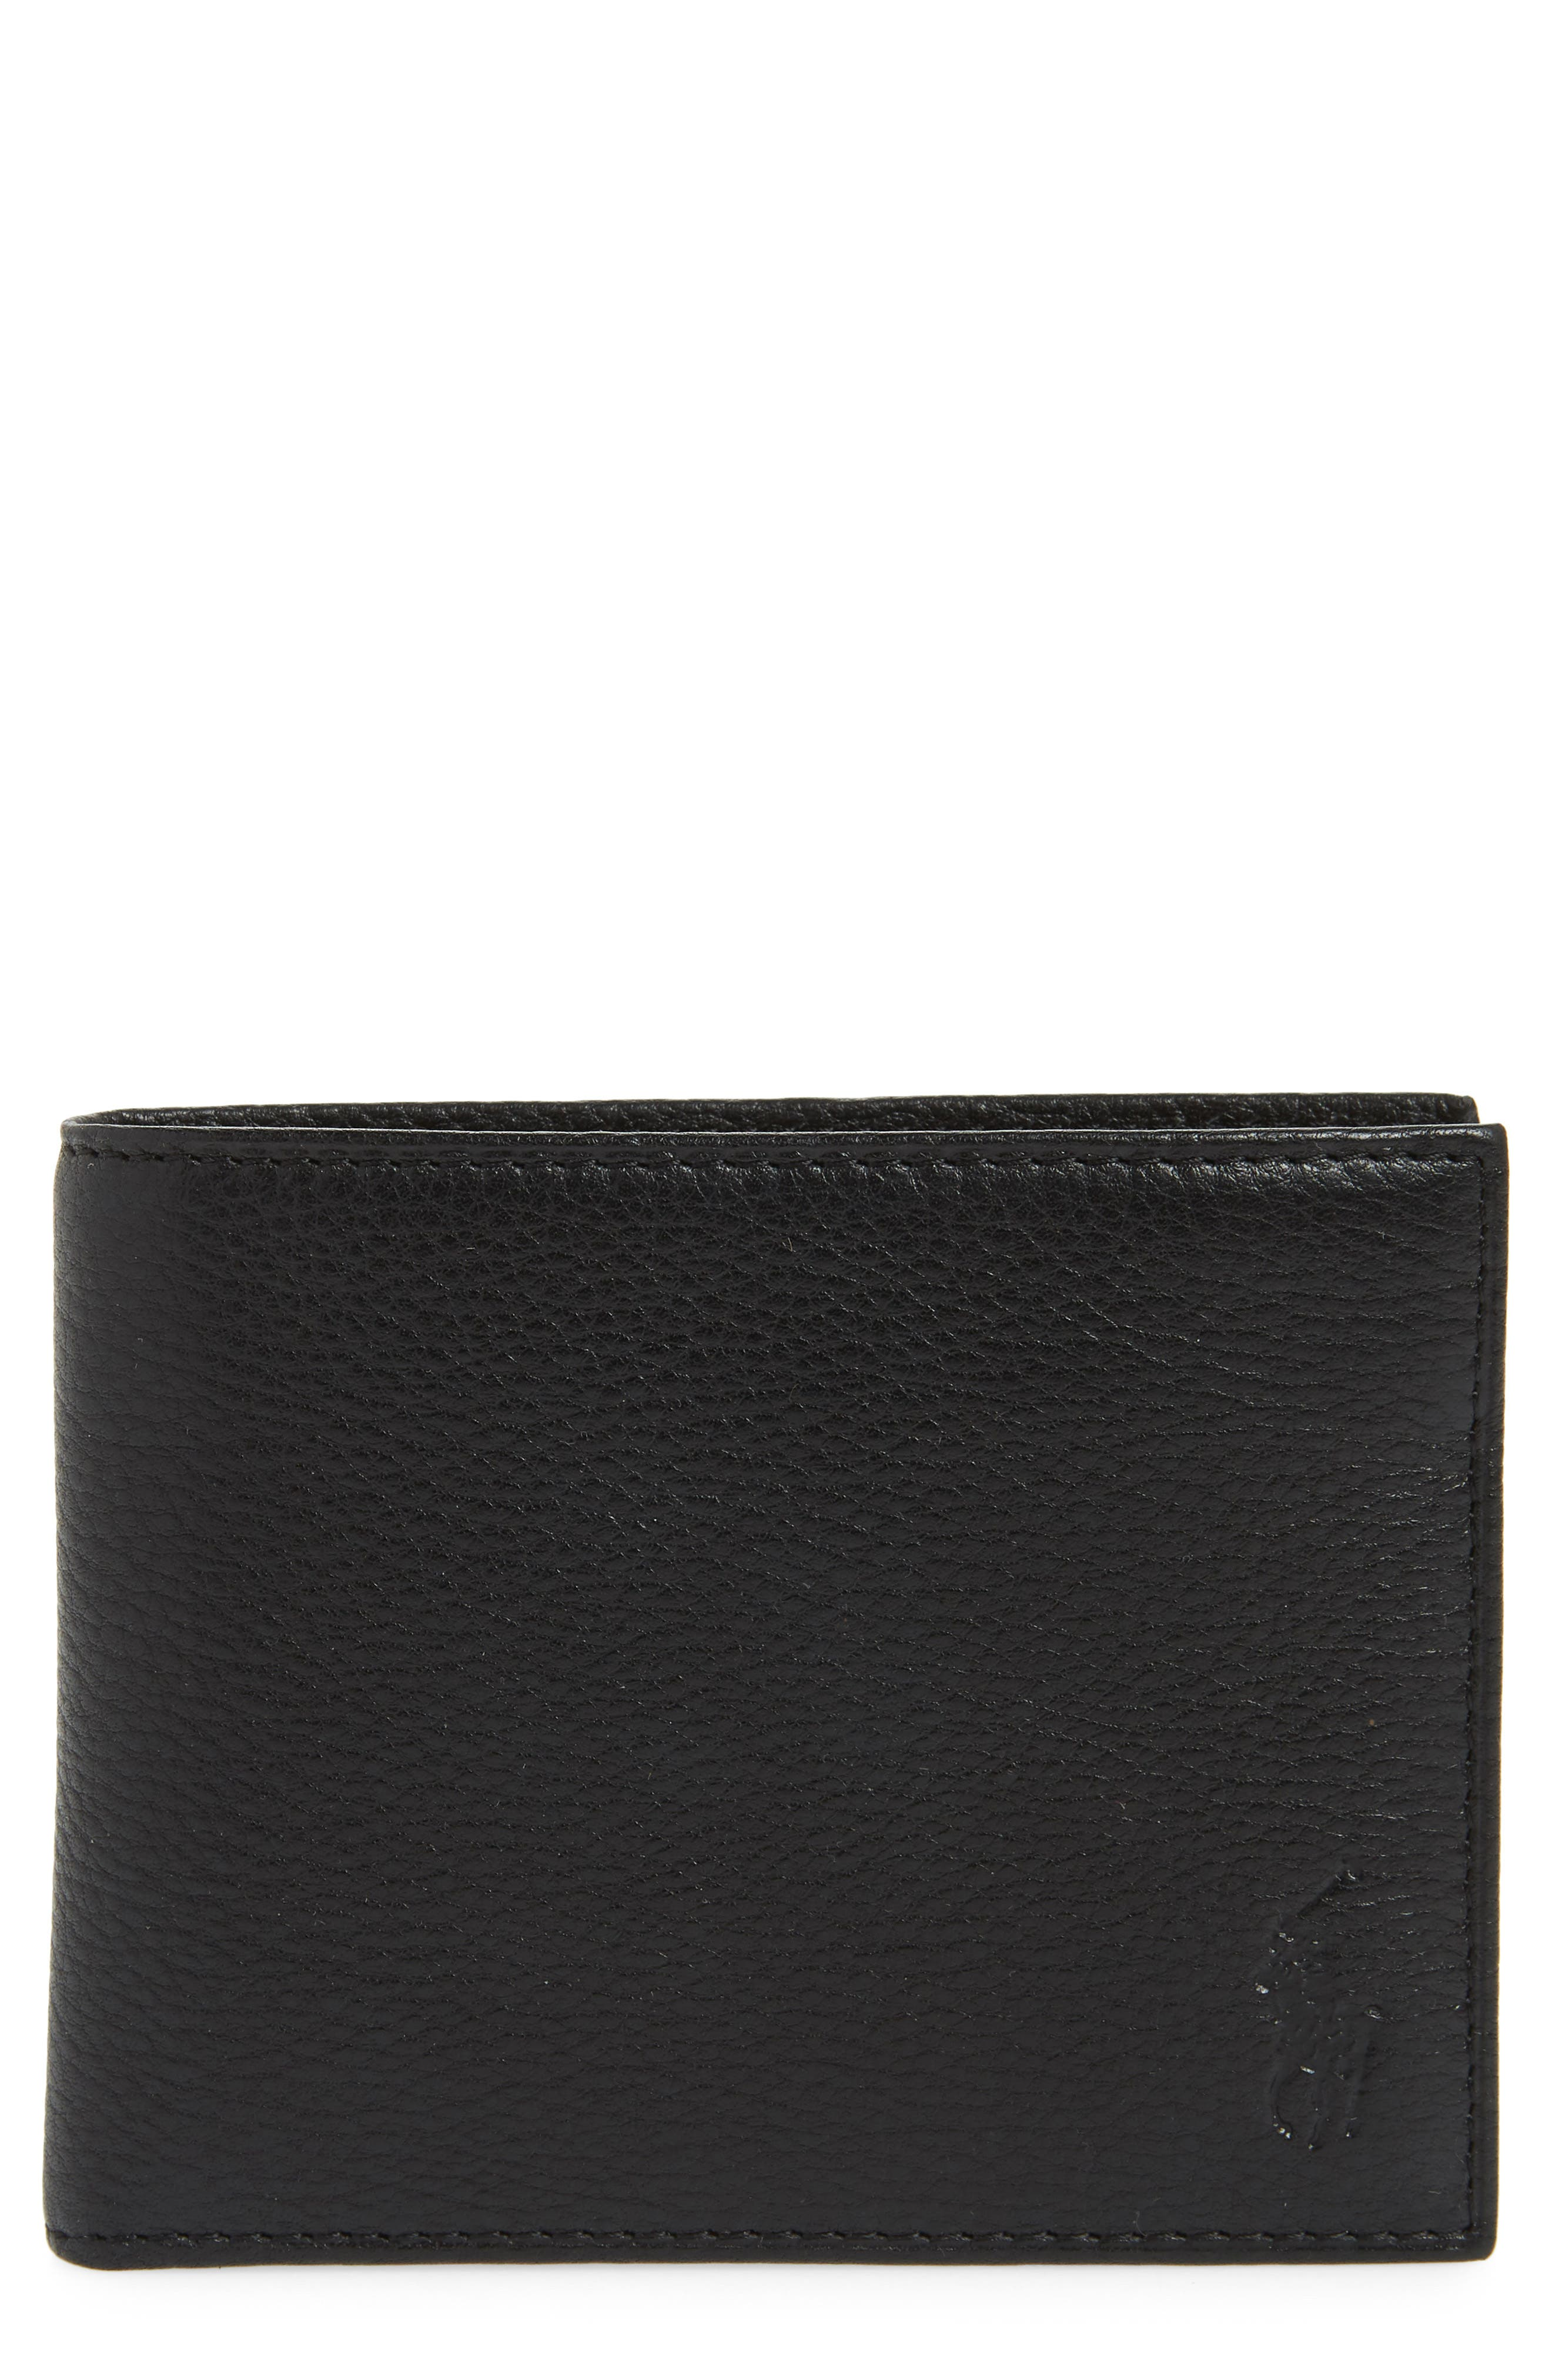 Main Image - Polo Ralph Lauren Leather Passcase Wallet